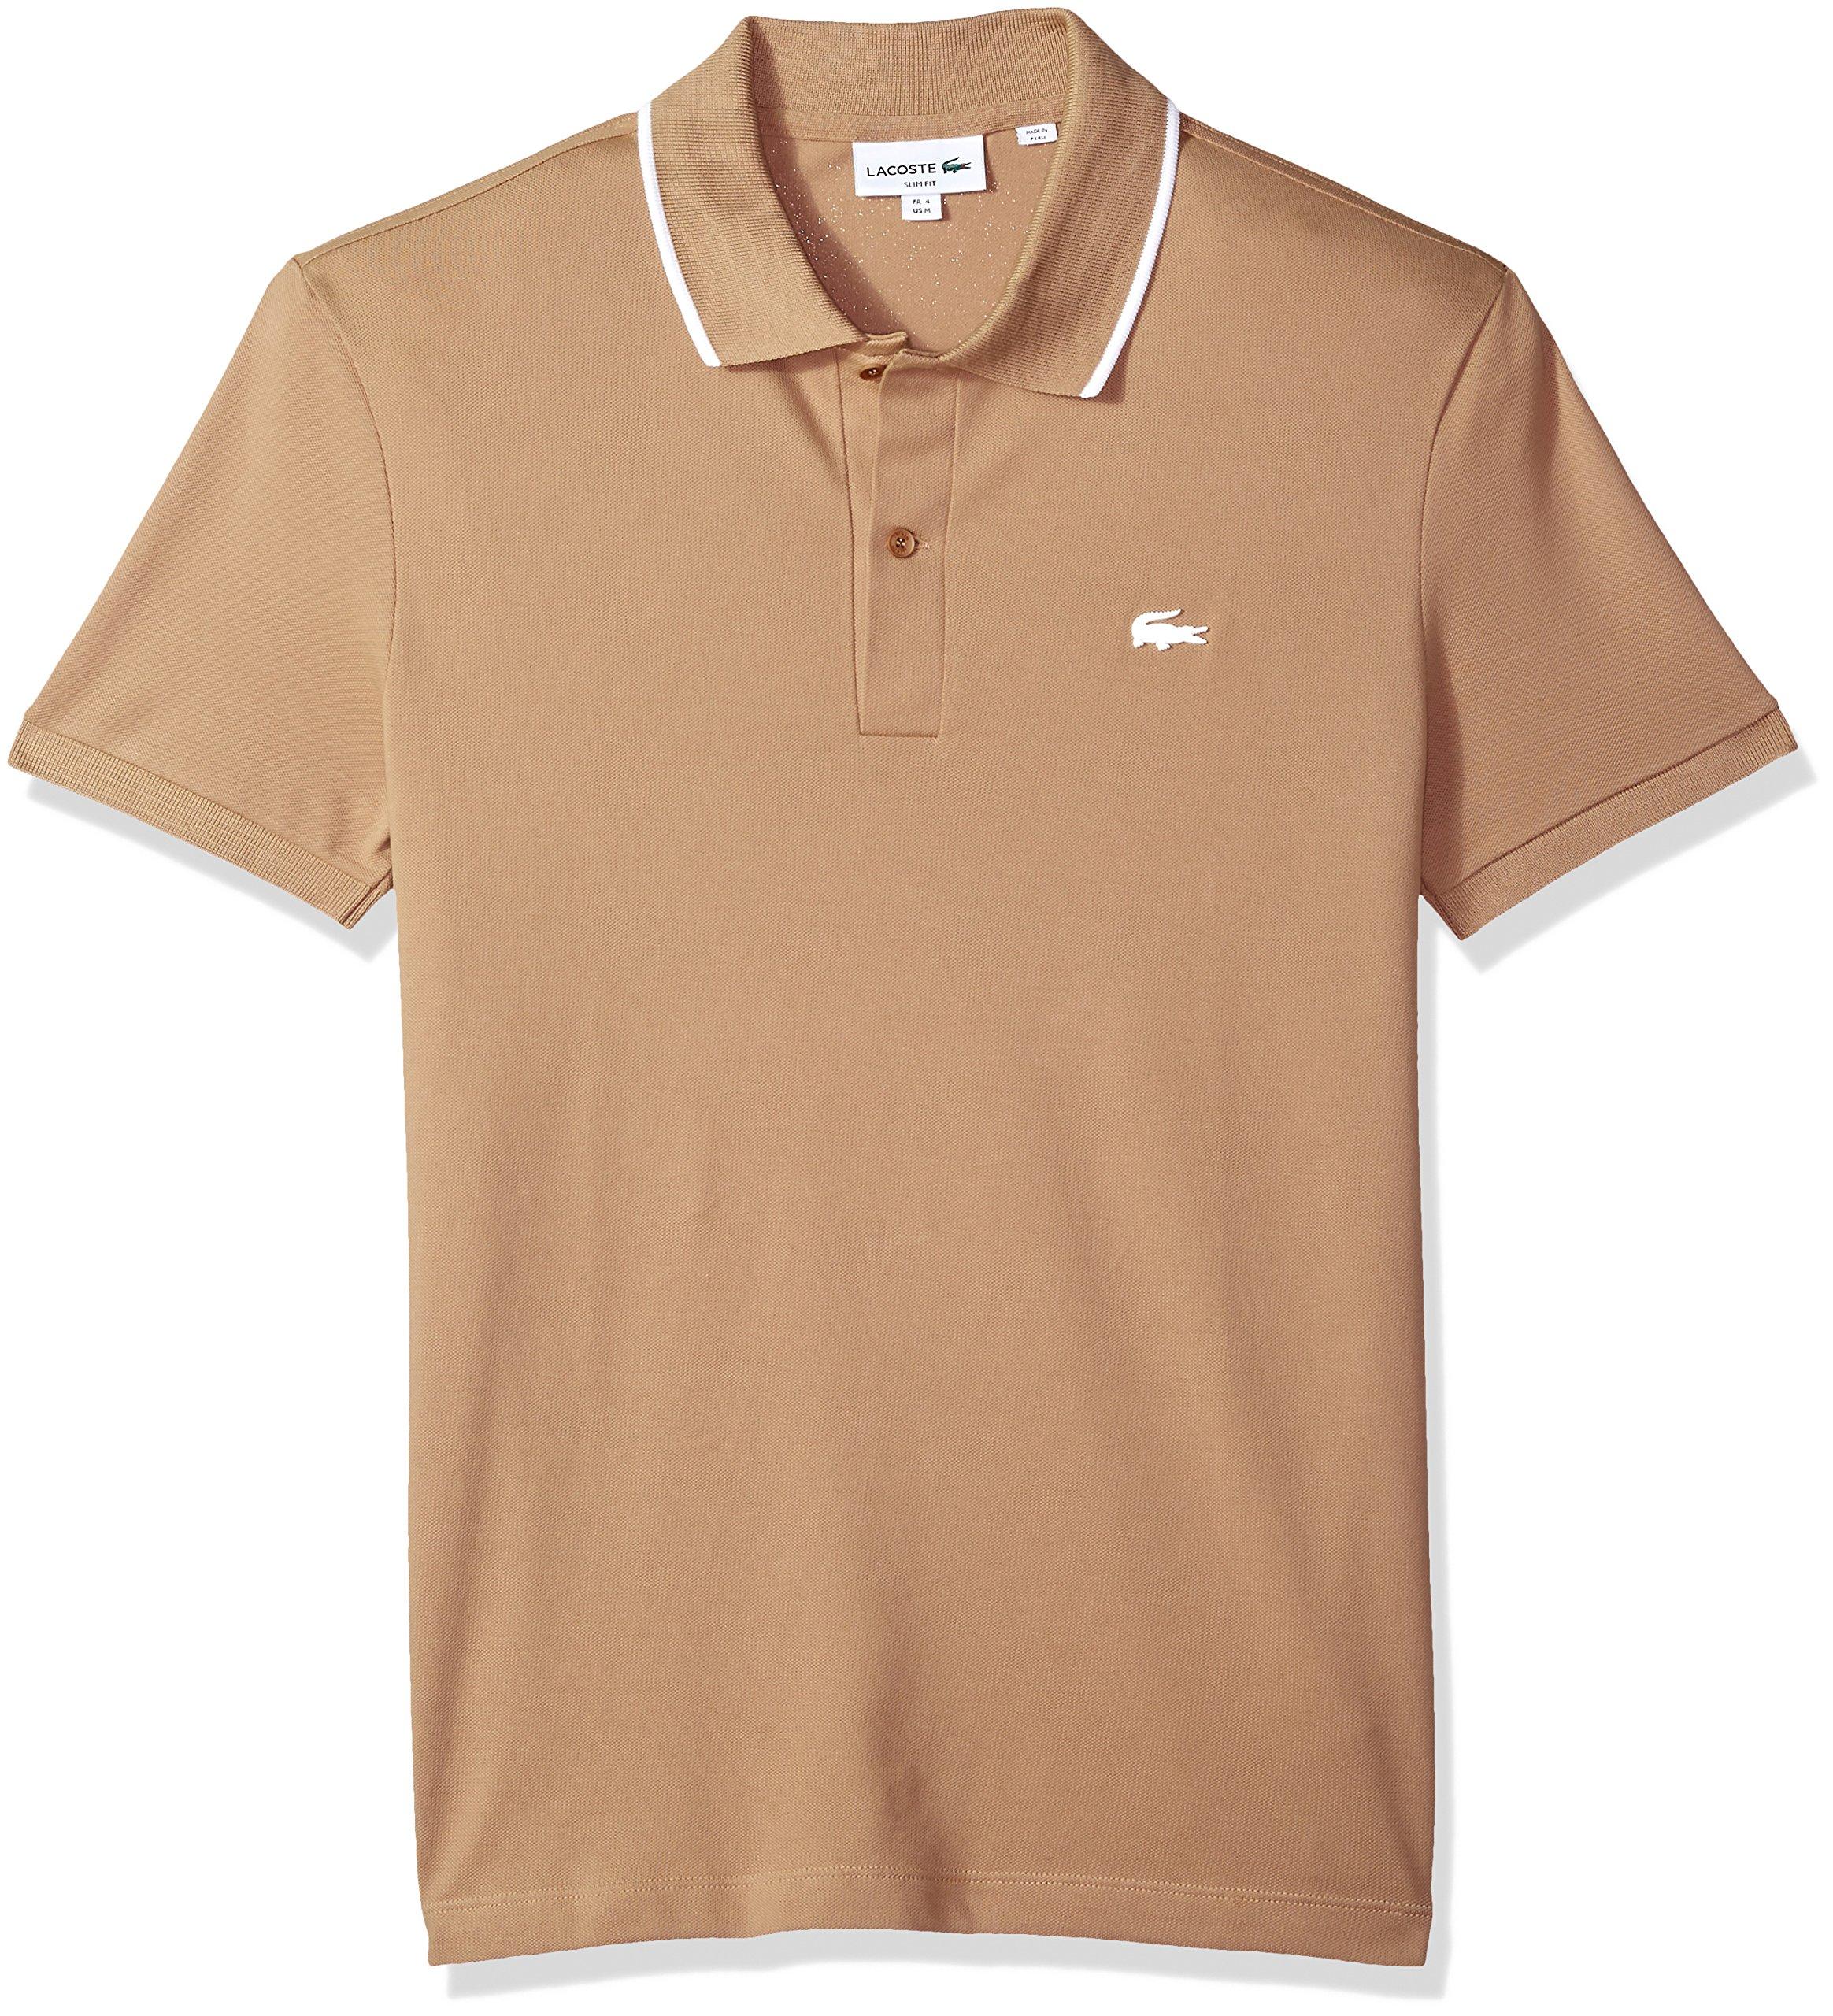 Lacoste Men's Short Sleeve Semi Fancy Stretch Pique Slim Polo, Ph3155, Kraft Beige/White, 9